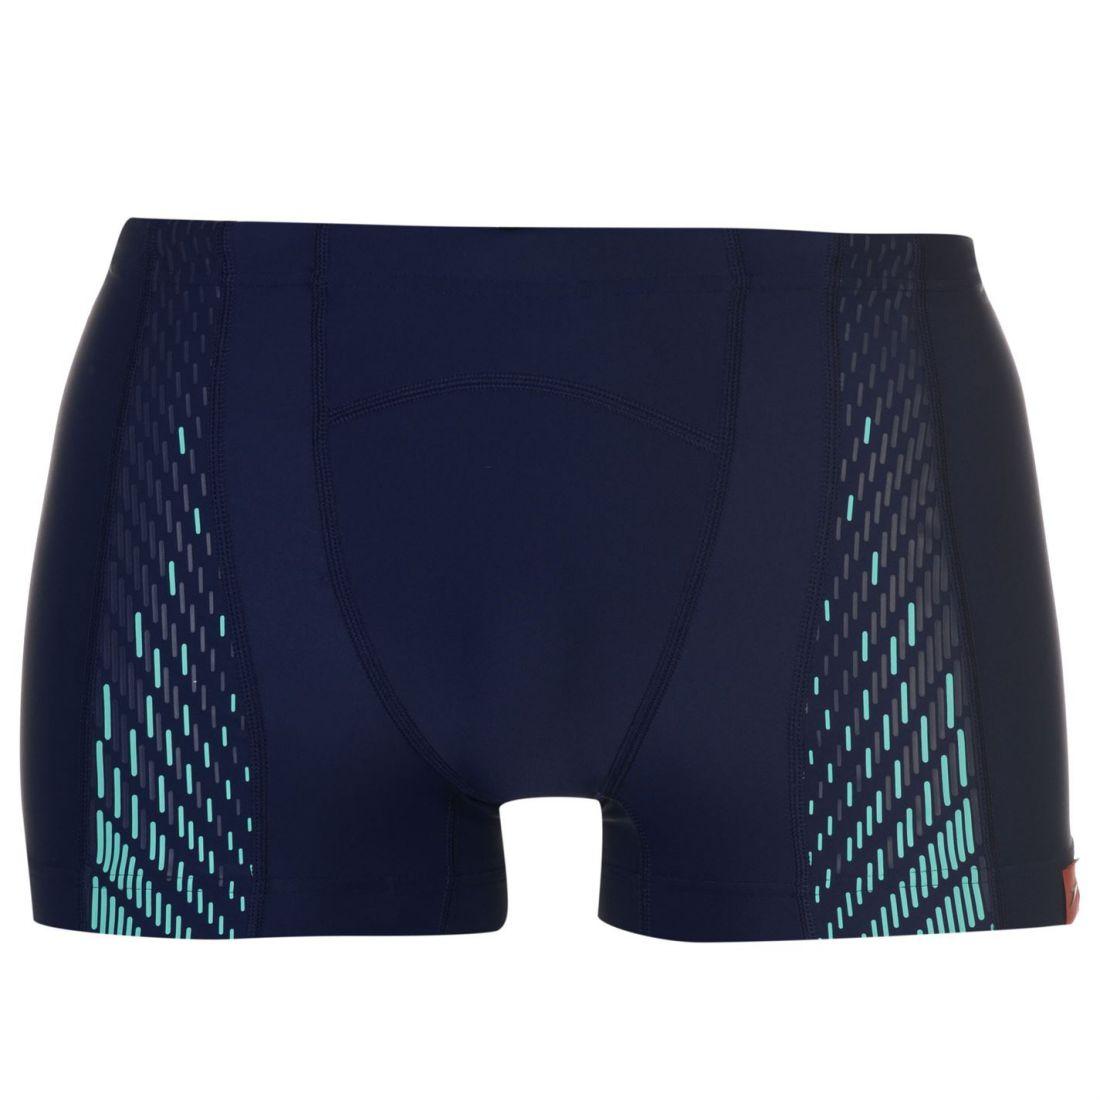 d5a3d85054 Details about Speedo Mens Fit Panel Aqua Shorts Swimming Boxer Pants  Trousers Bottoms Mesh